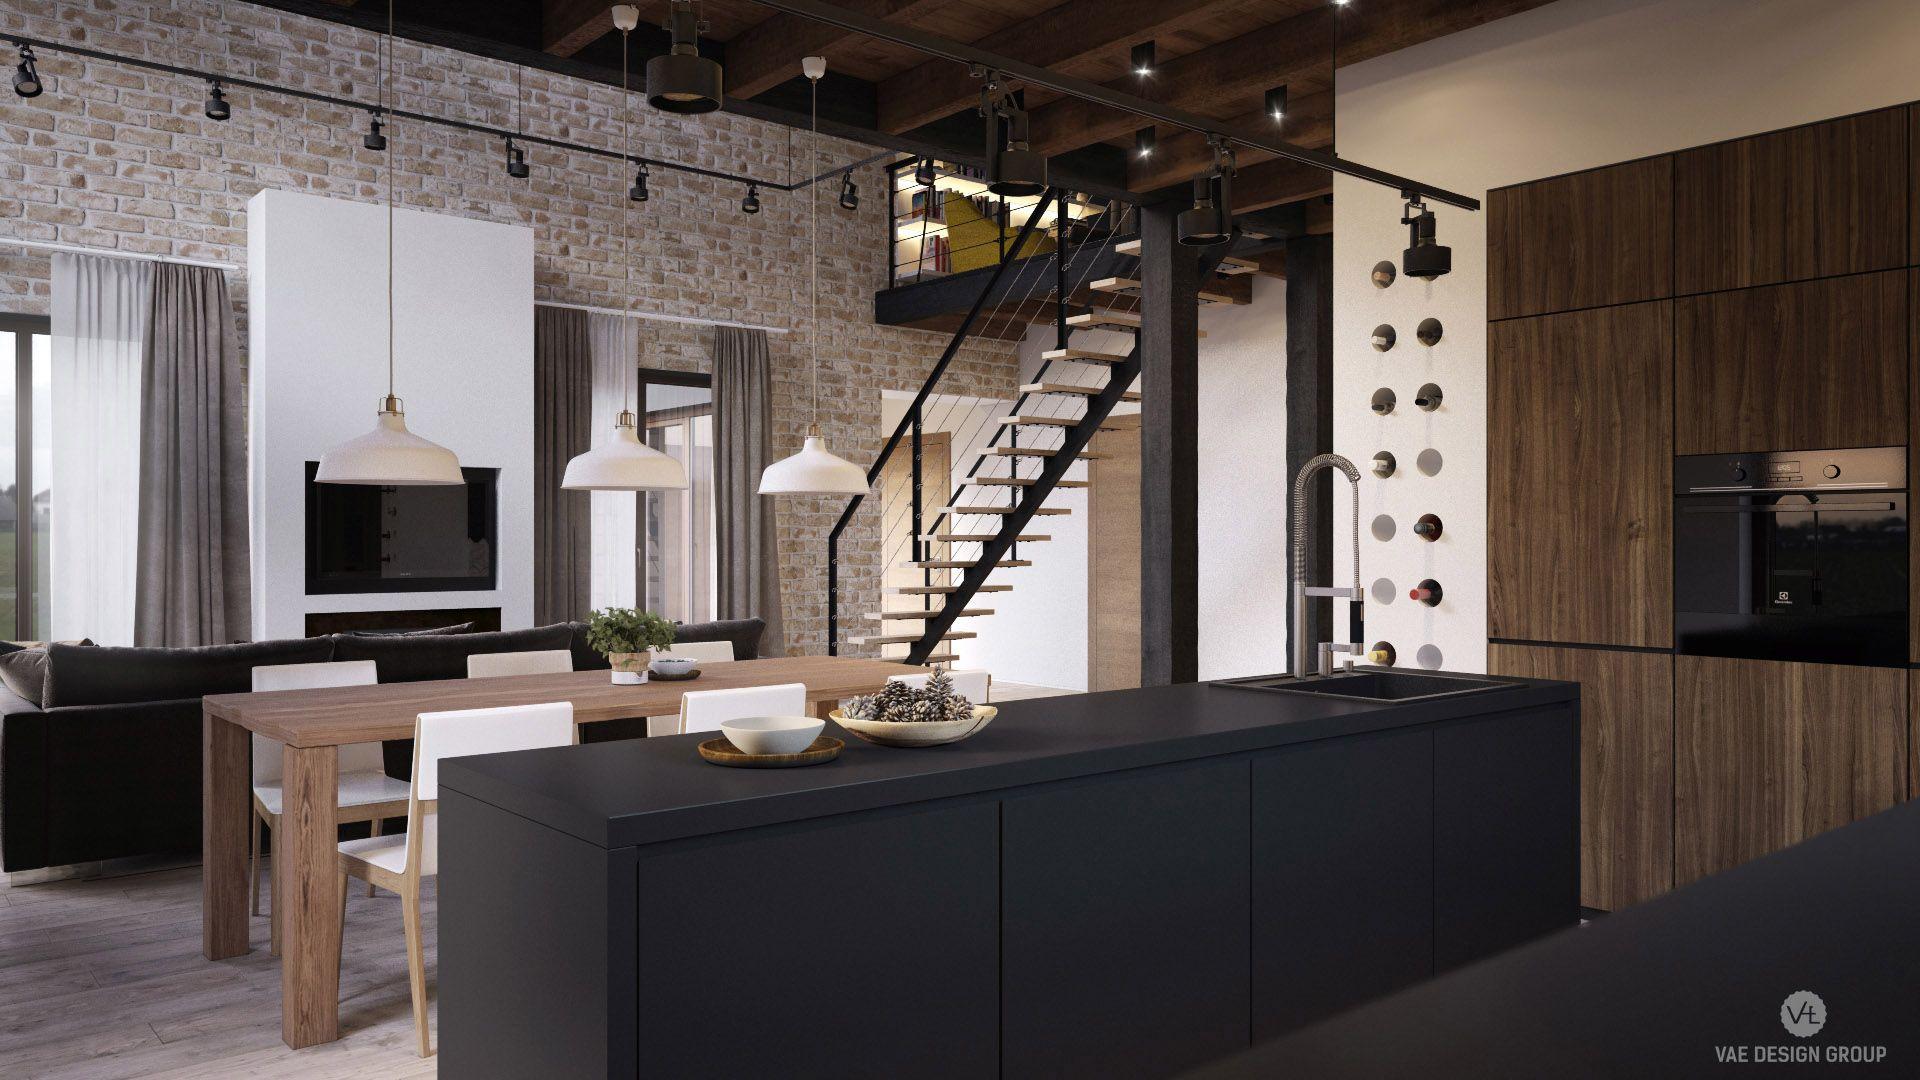 M Home Design Group Part - 49: Studio: Vae Design Group Designers : Eugene Varkovich, Vitalii Savko  Location: Belarus Area